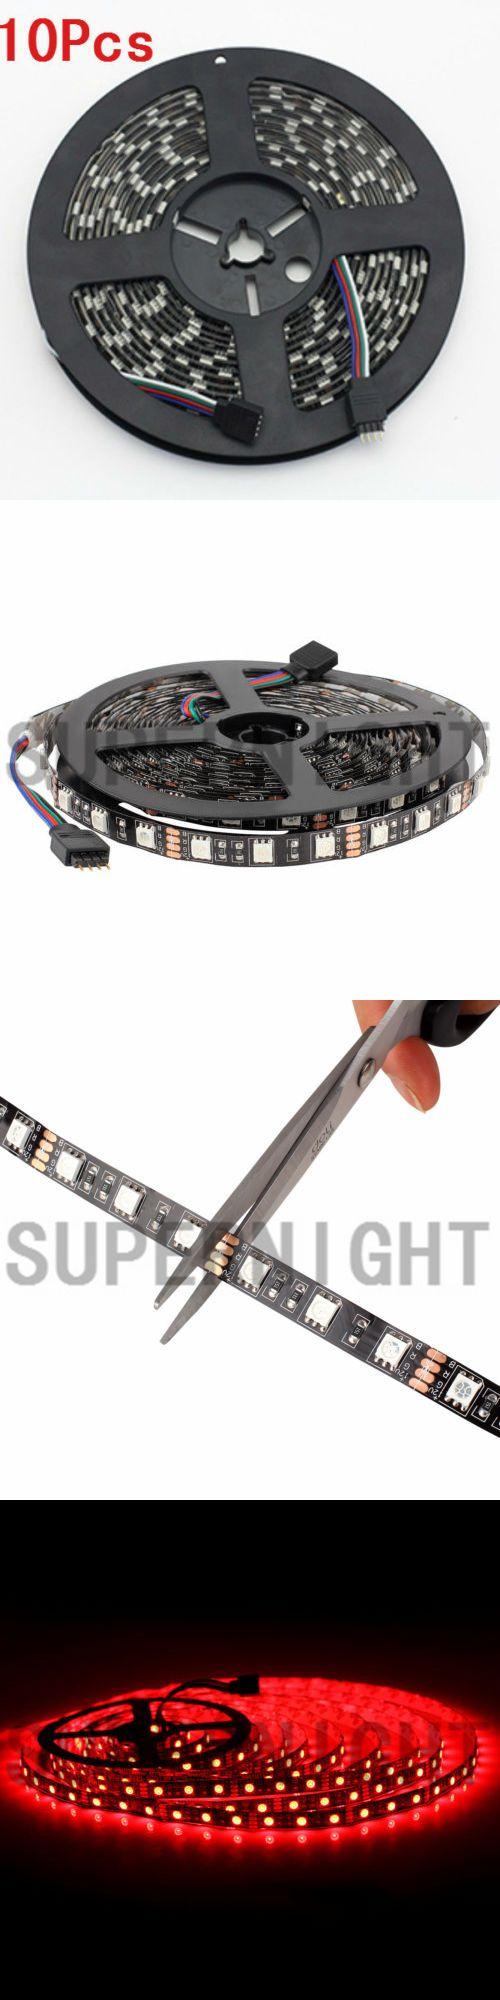 String Lights Fairy Lights 116022: 10Pcs Black Pcb 5M 300Leds Rgb 5050 Smd Flexible Led Strip Light Lamp Waterproof -> BUY IT NOW ONLY: $89.99 on eBay!